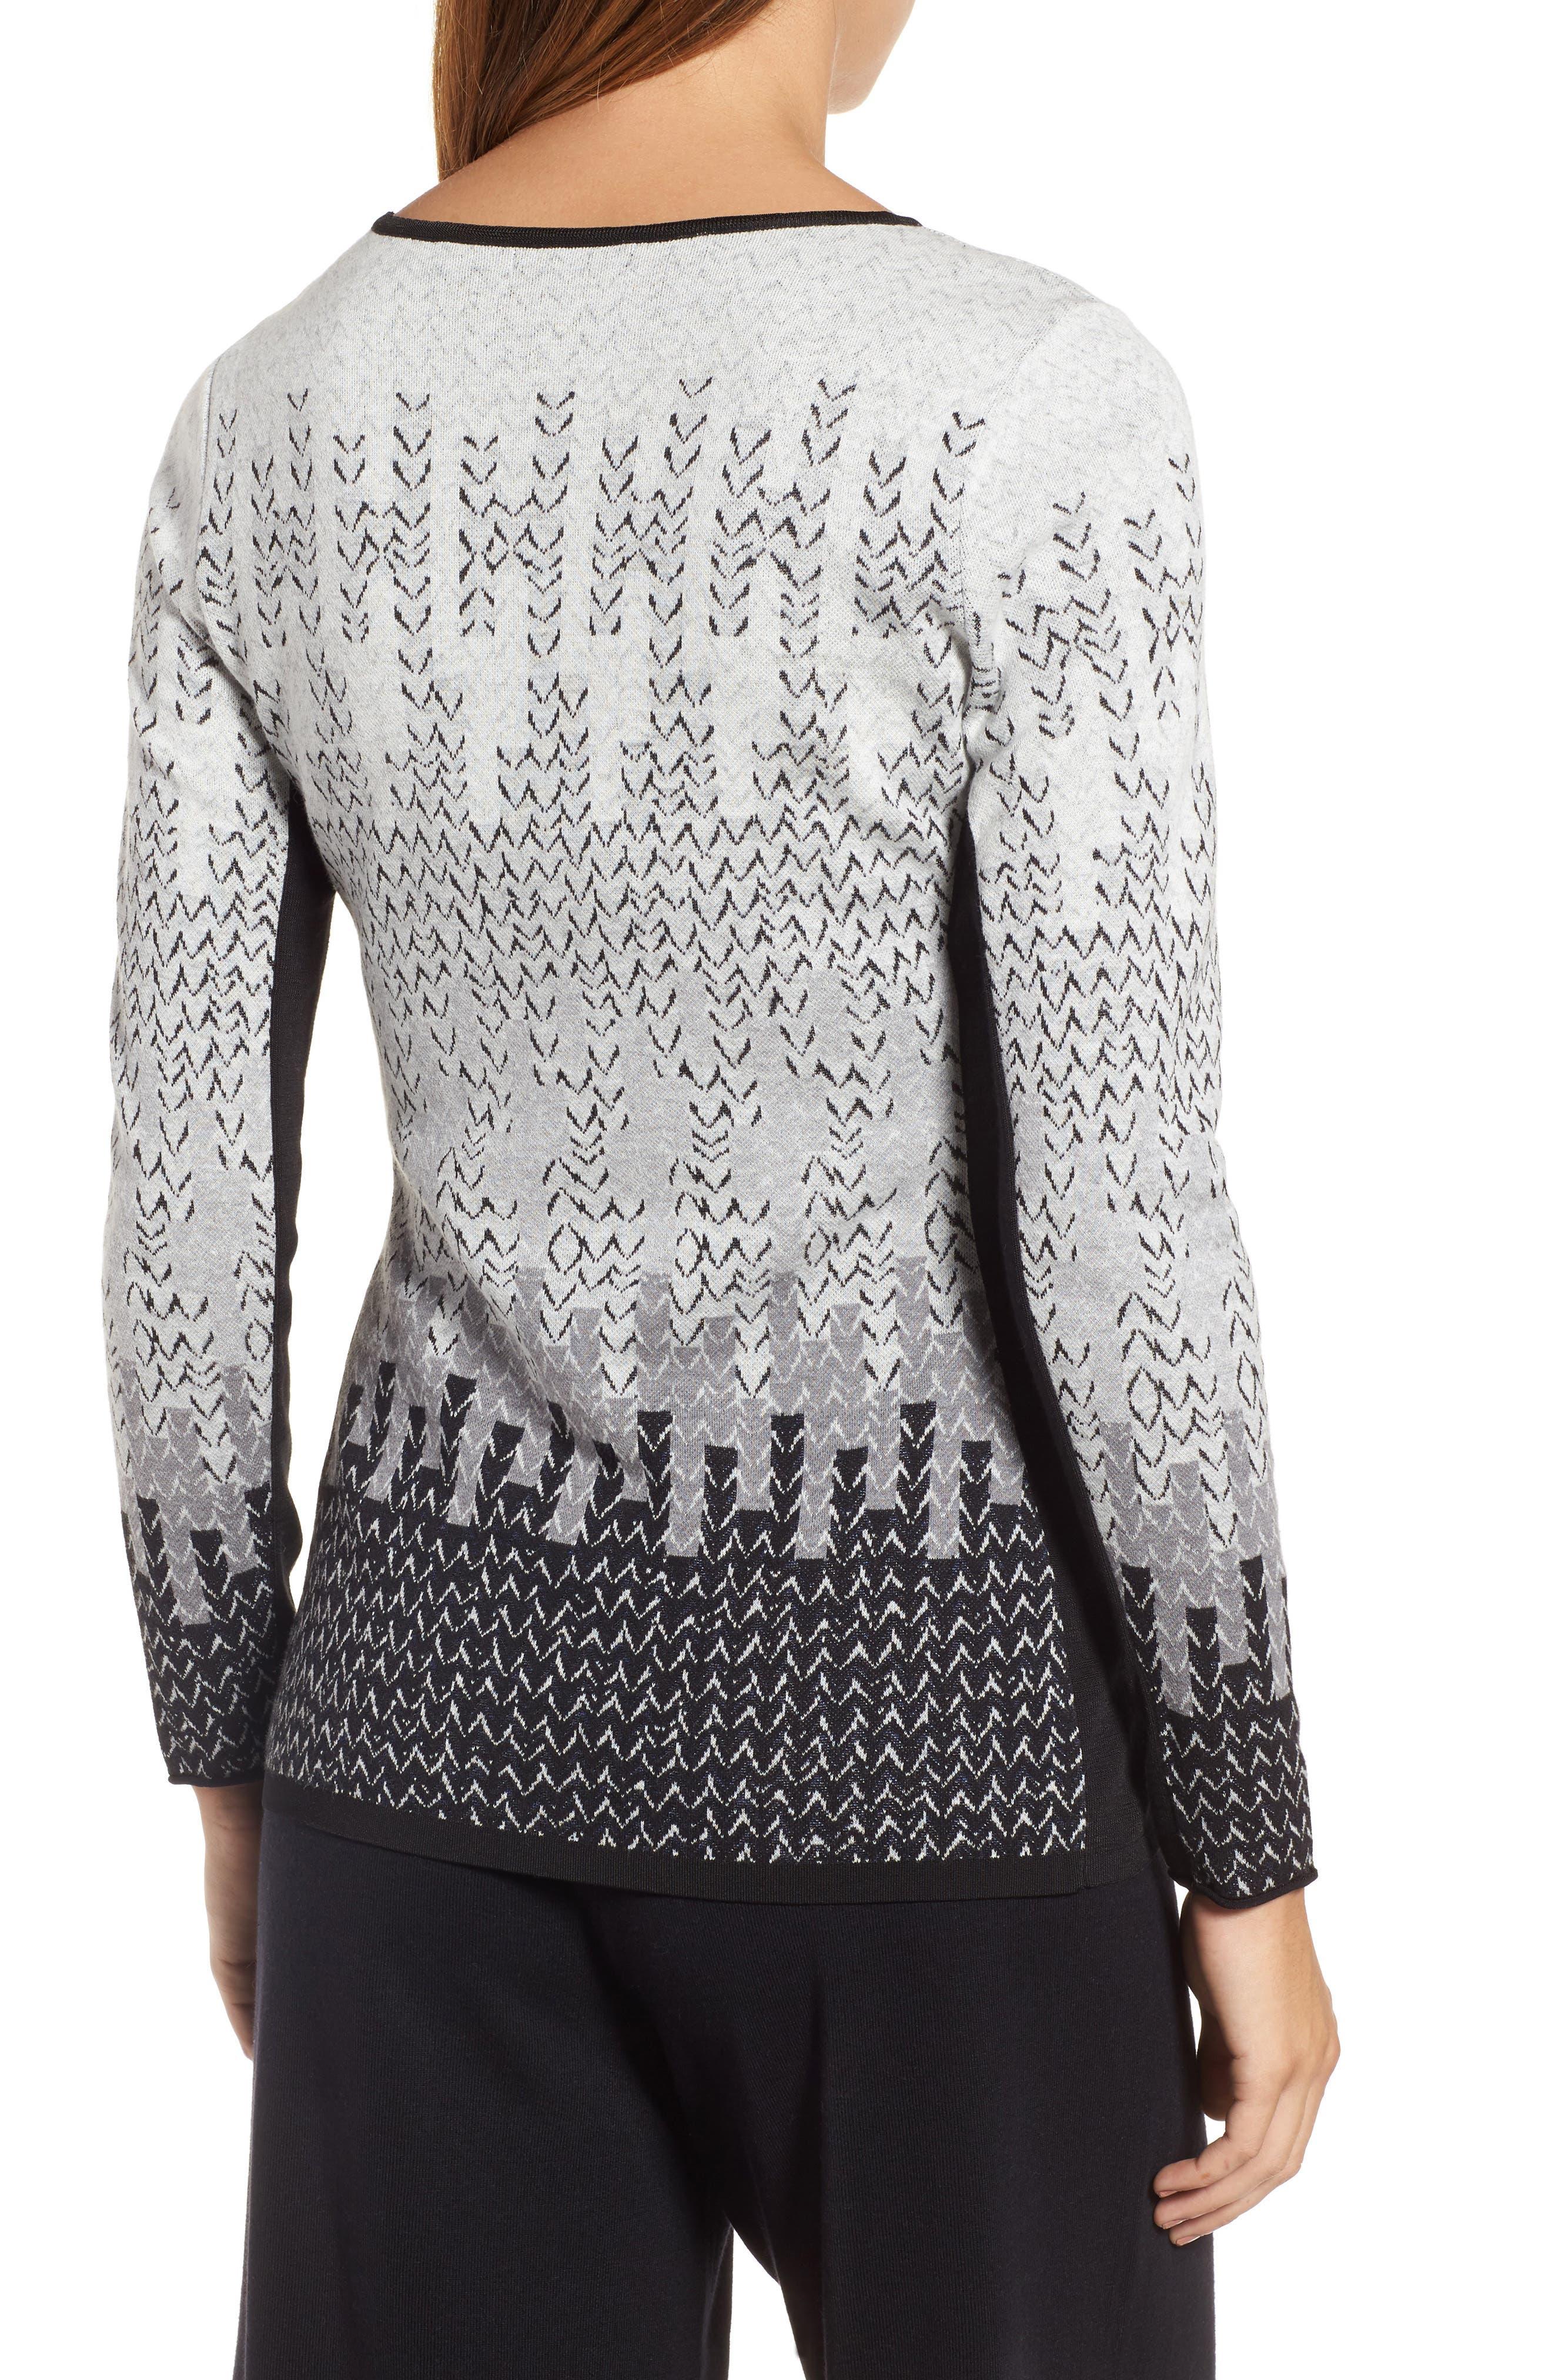 Sunset Sweater,                             Alternate thumbnail 2, color,                             027